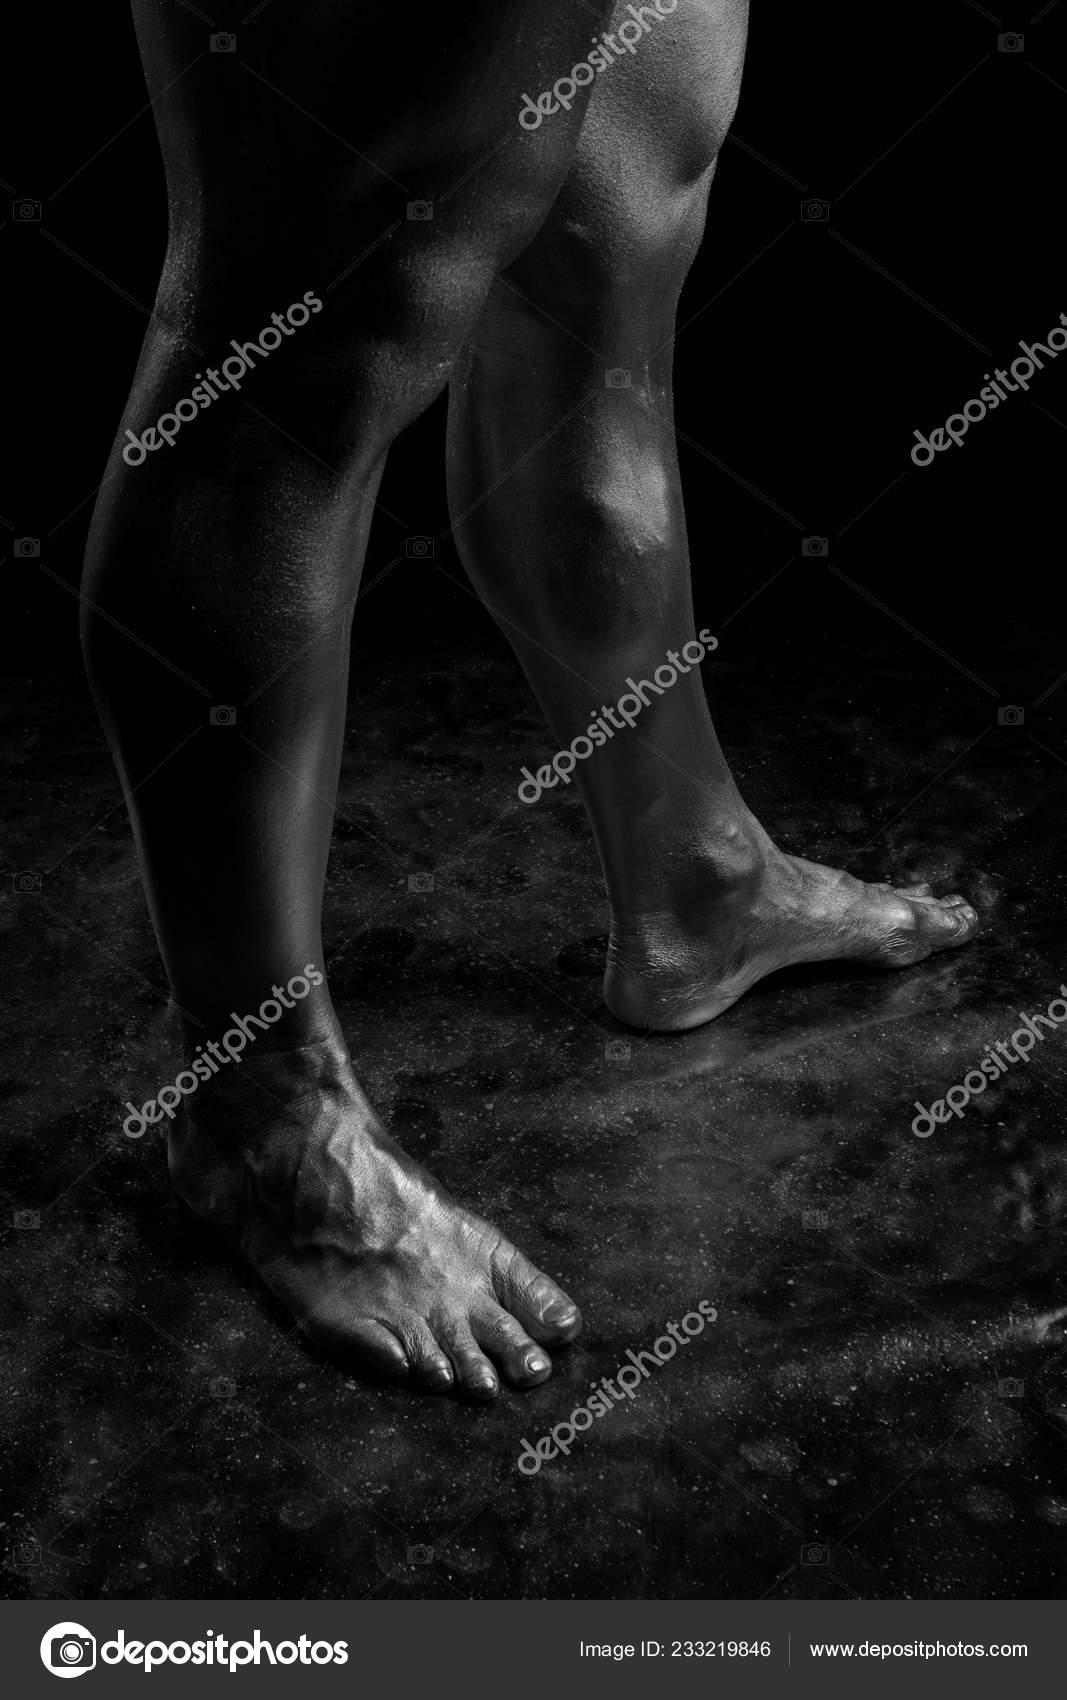 фото мужских ног на телефон родители братьев